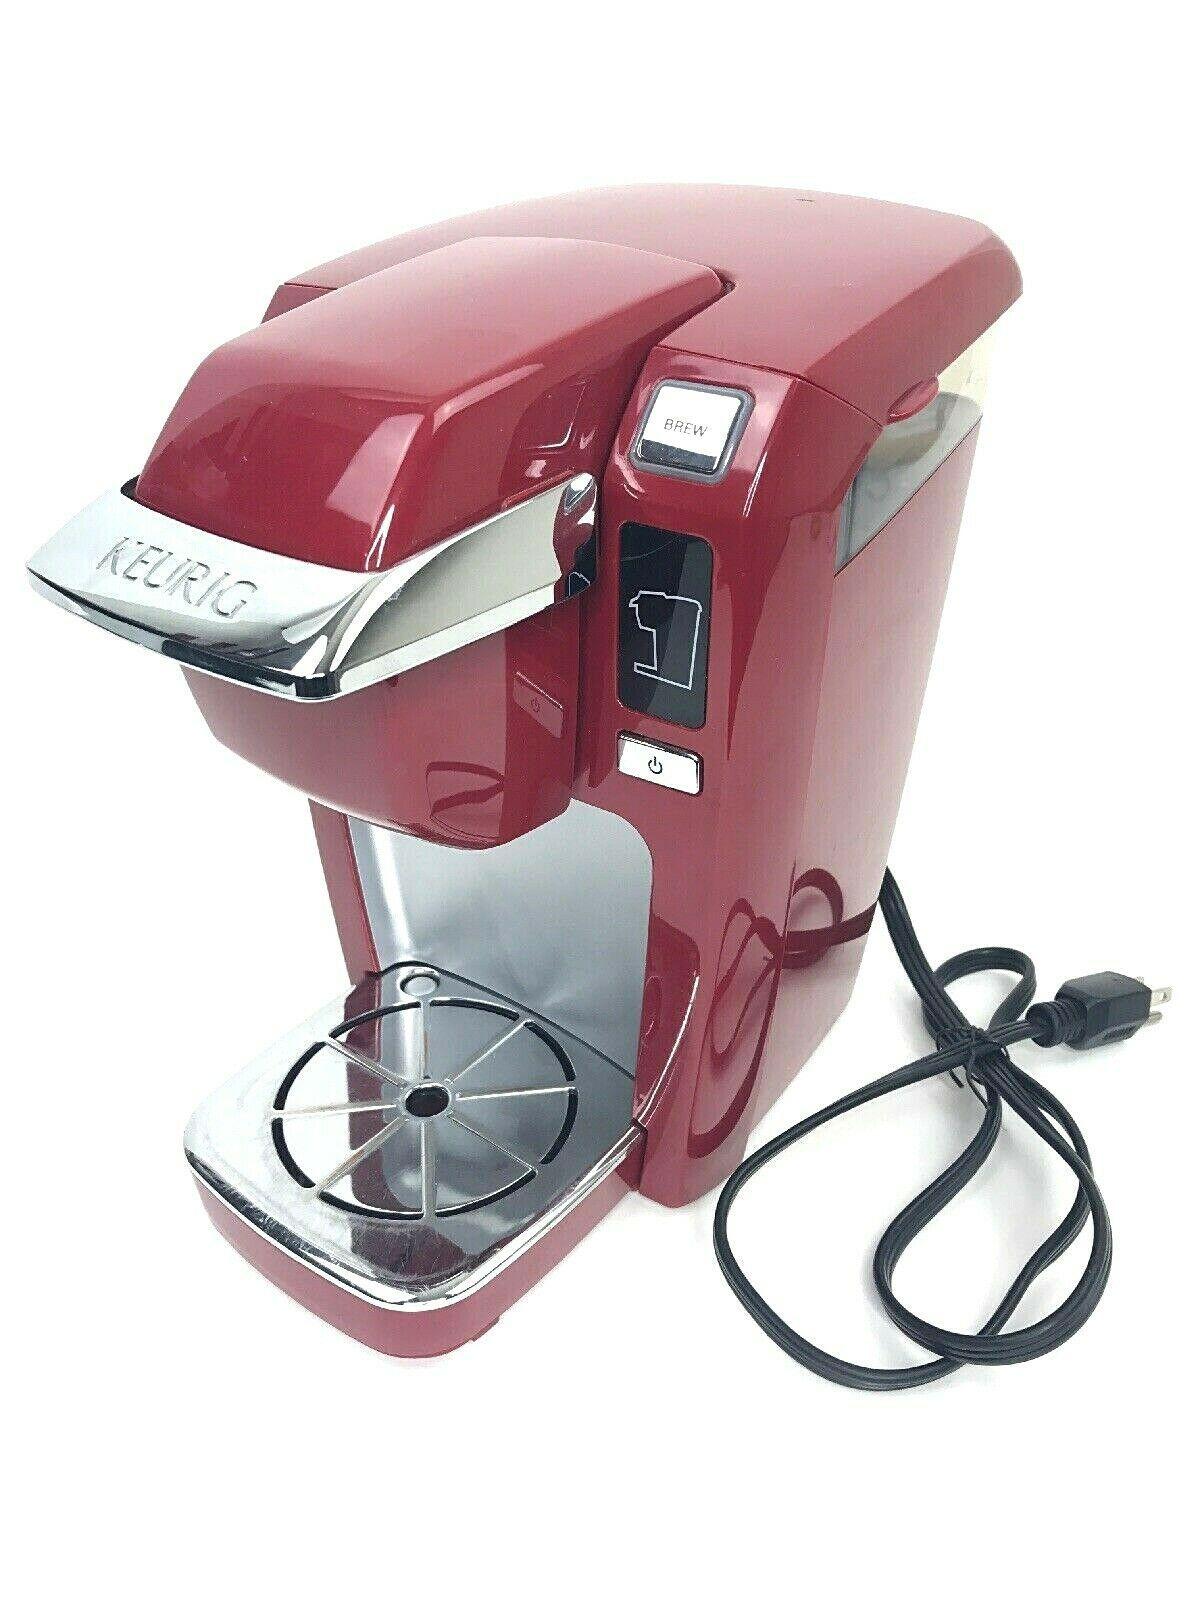 Details about Keurig K10 Mini KCup Brewer Coffee Maker